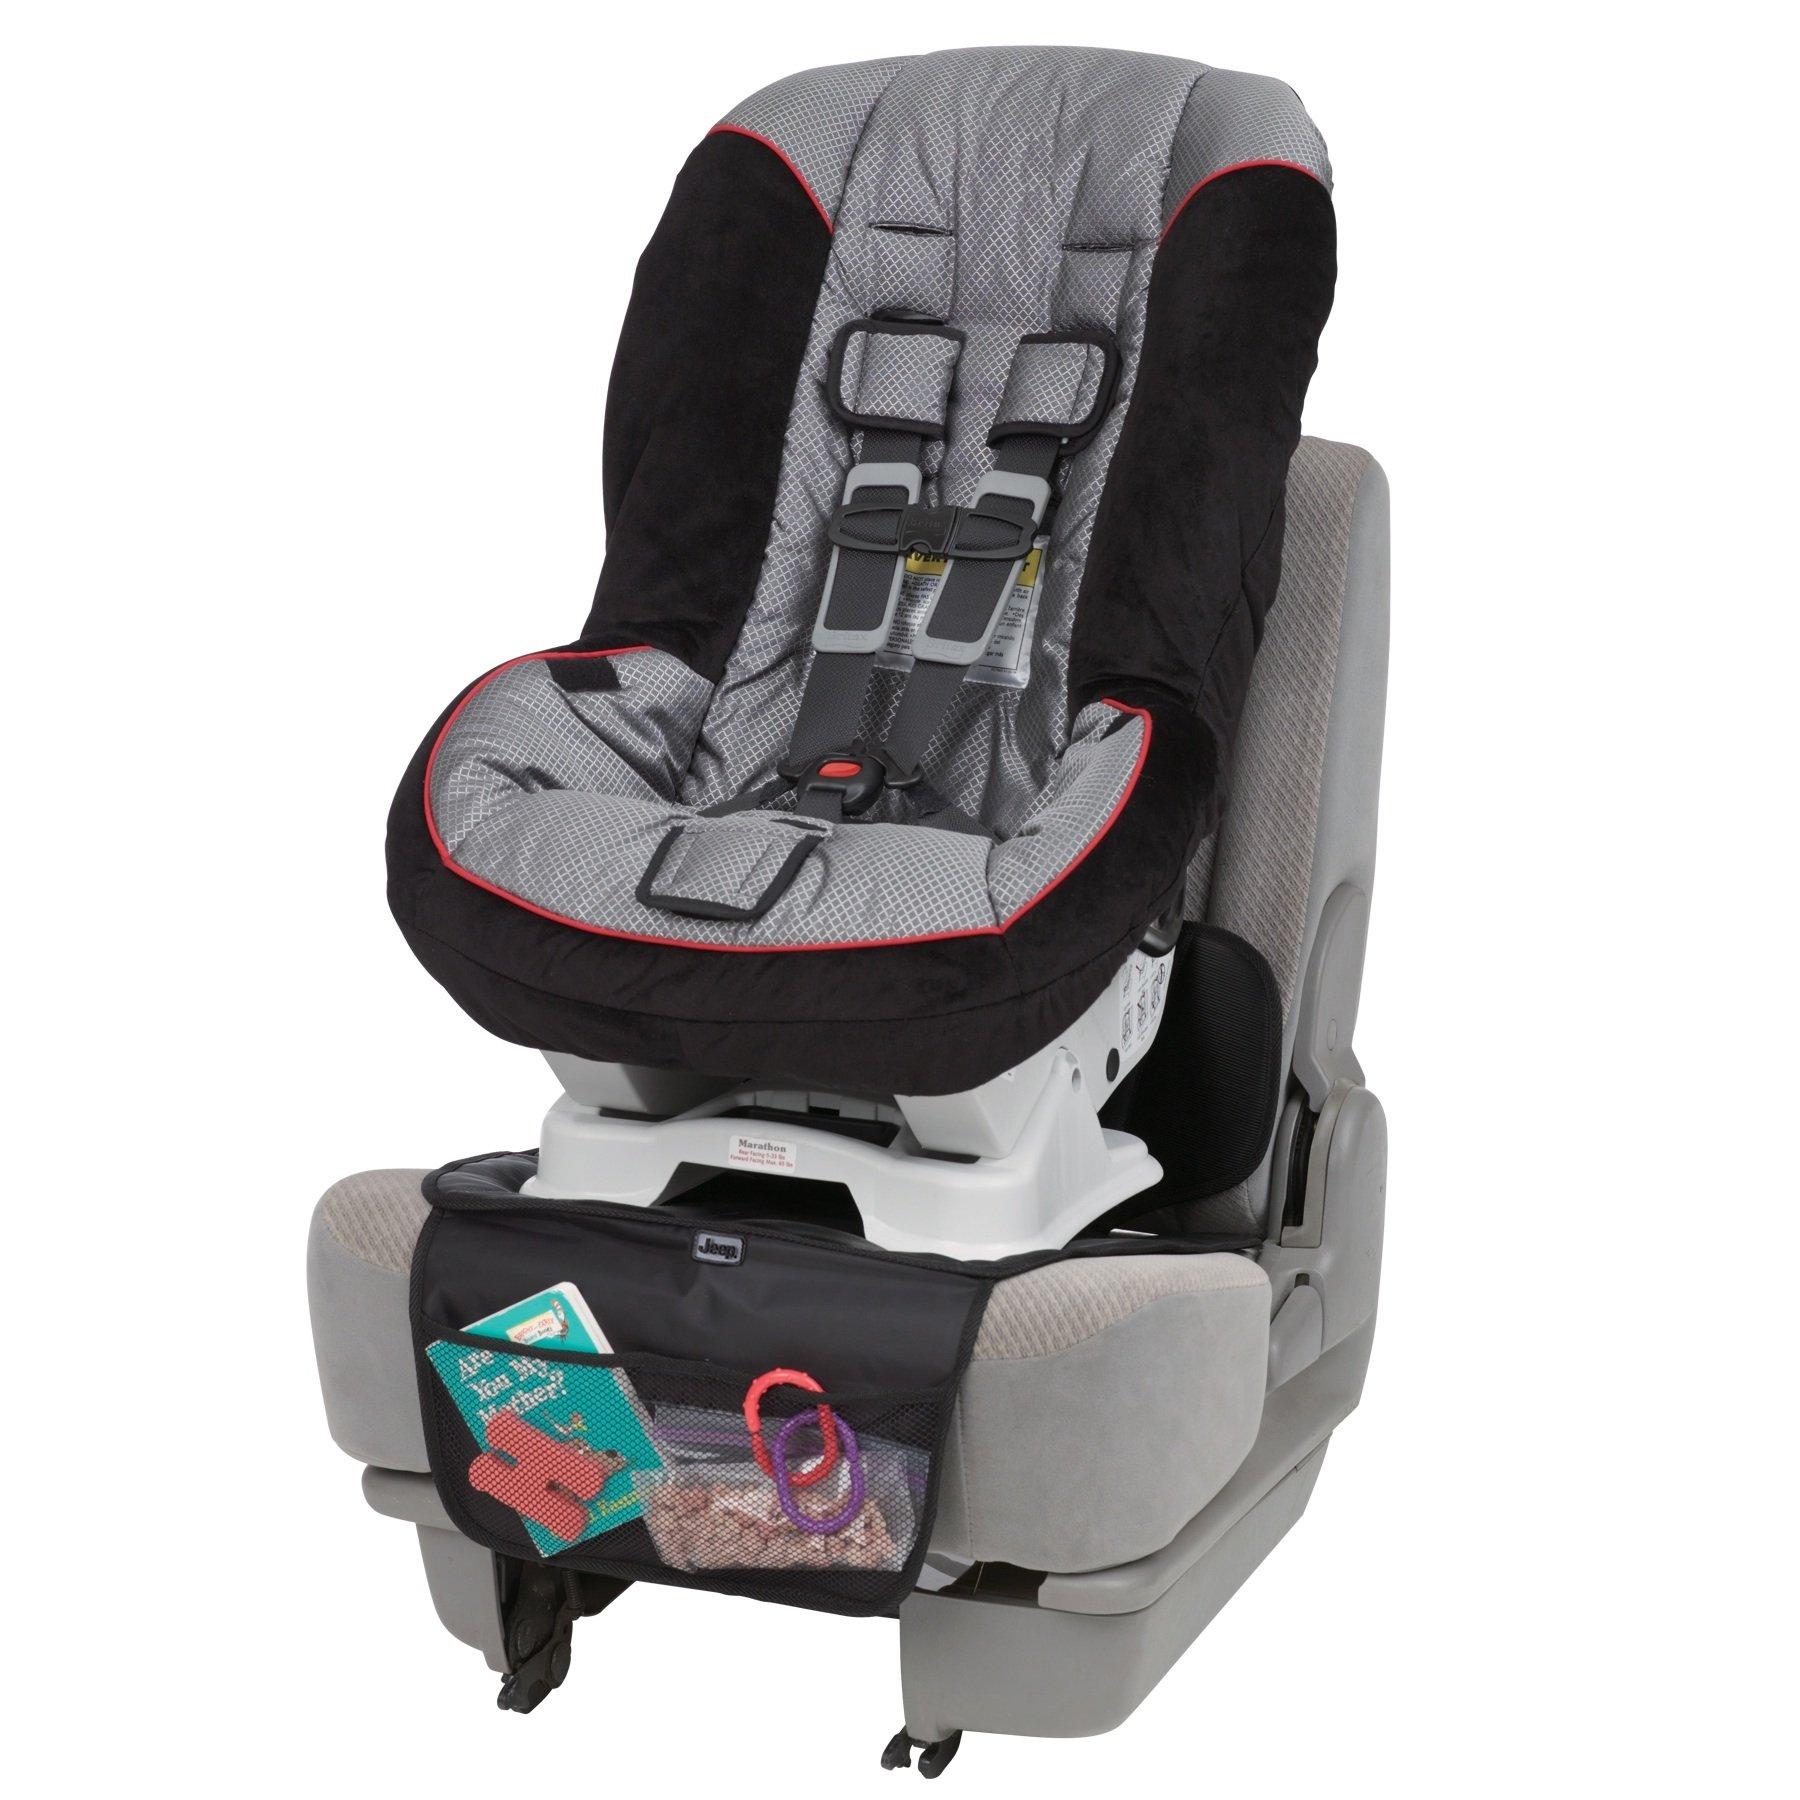 Amazon Jeep Back Seat Baby View Mirror Black Rear